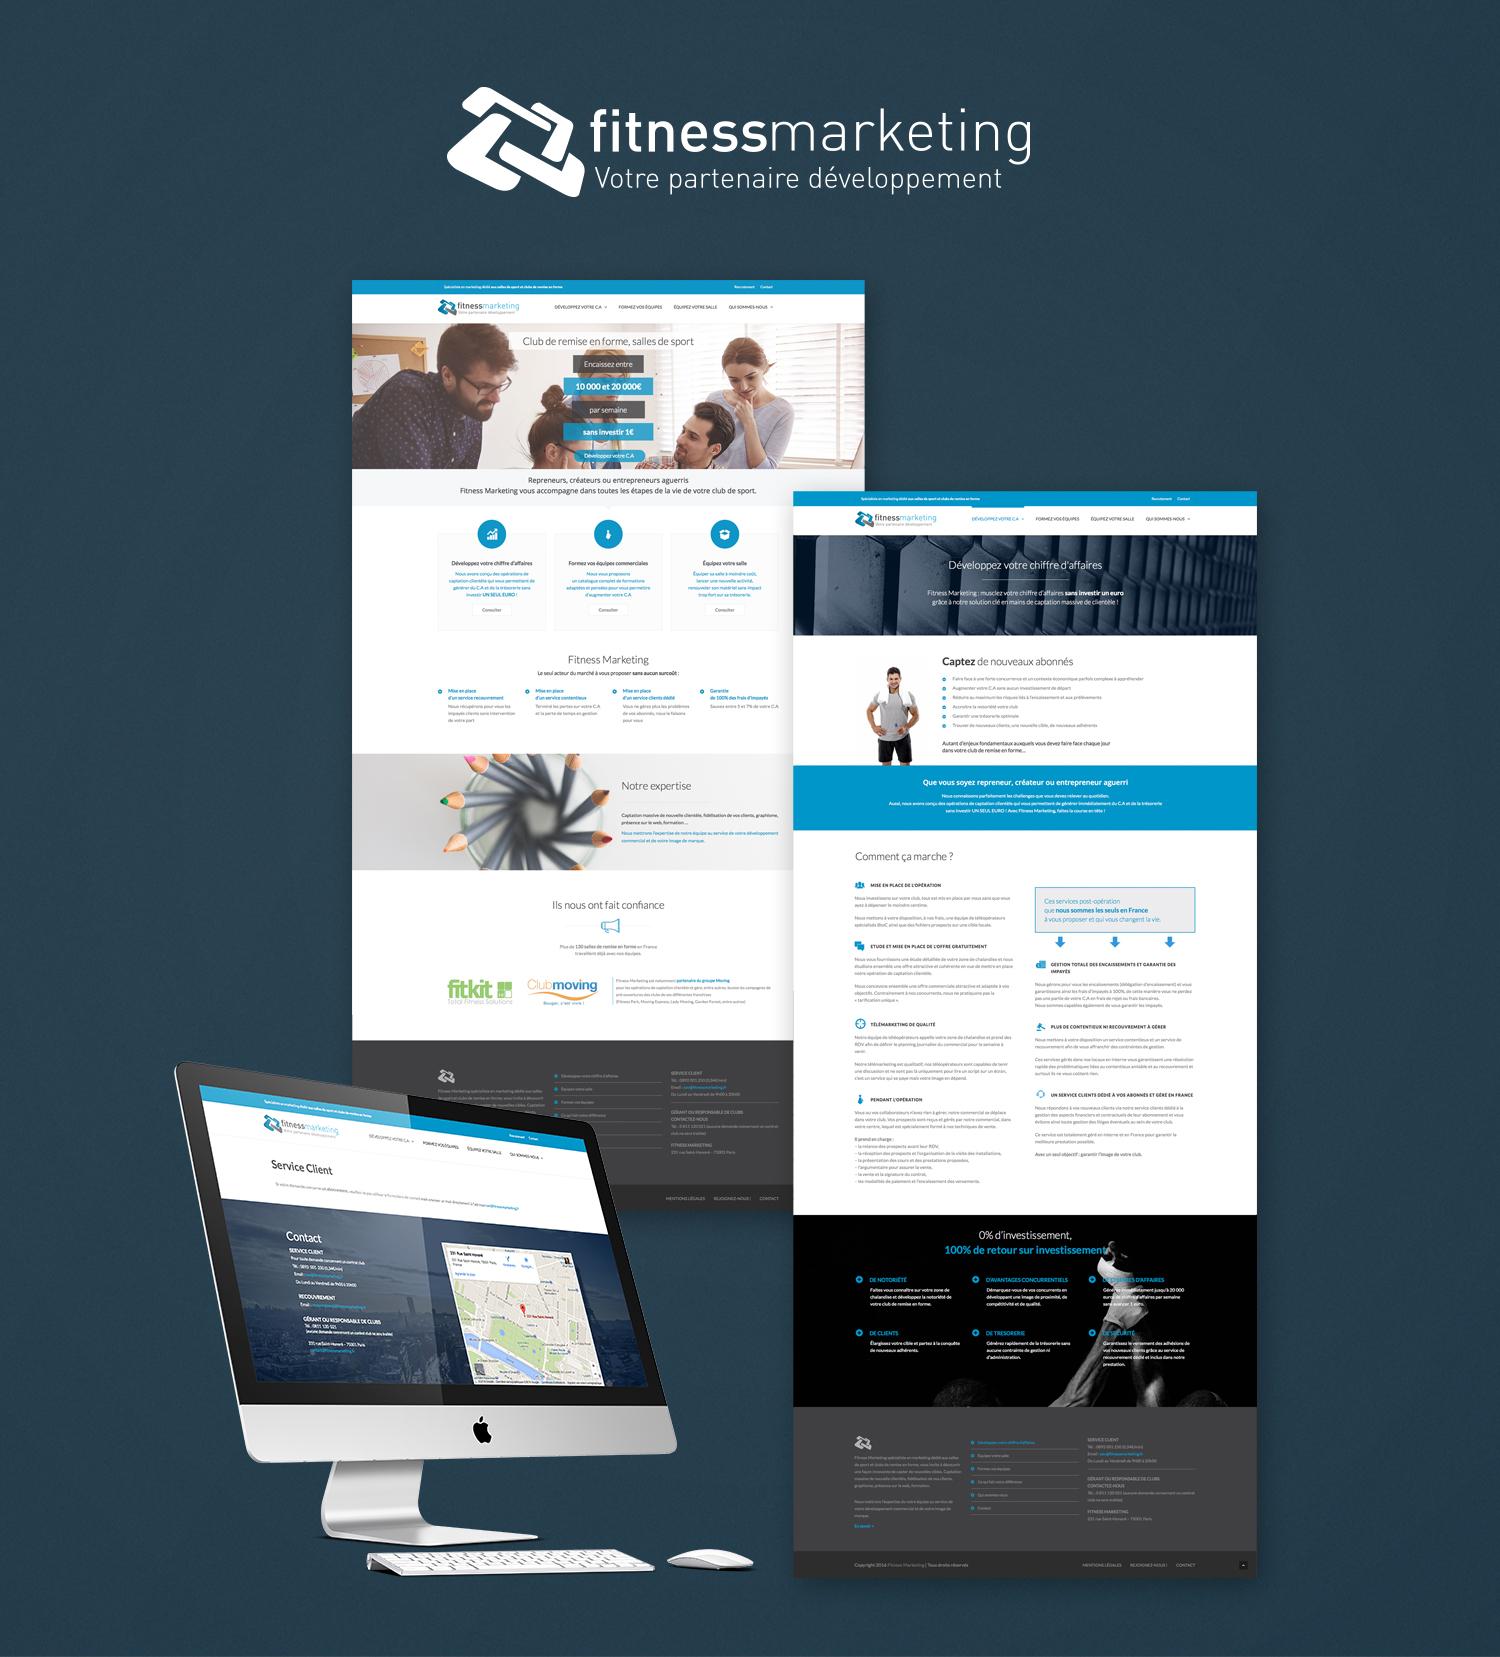 fitness-marketing-webdesign